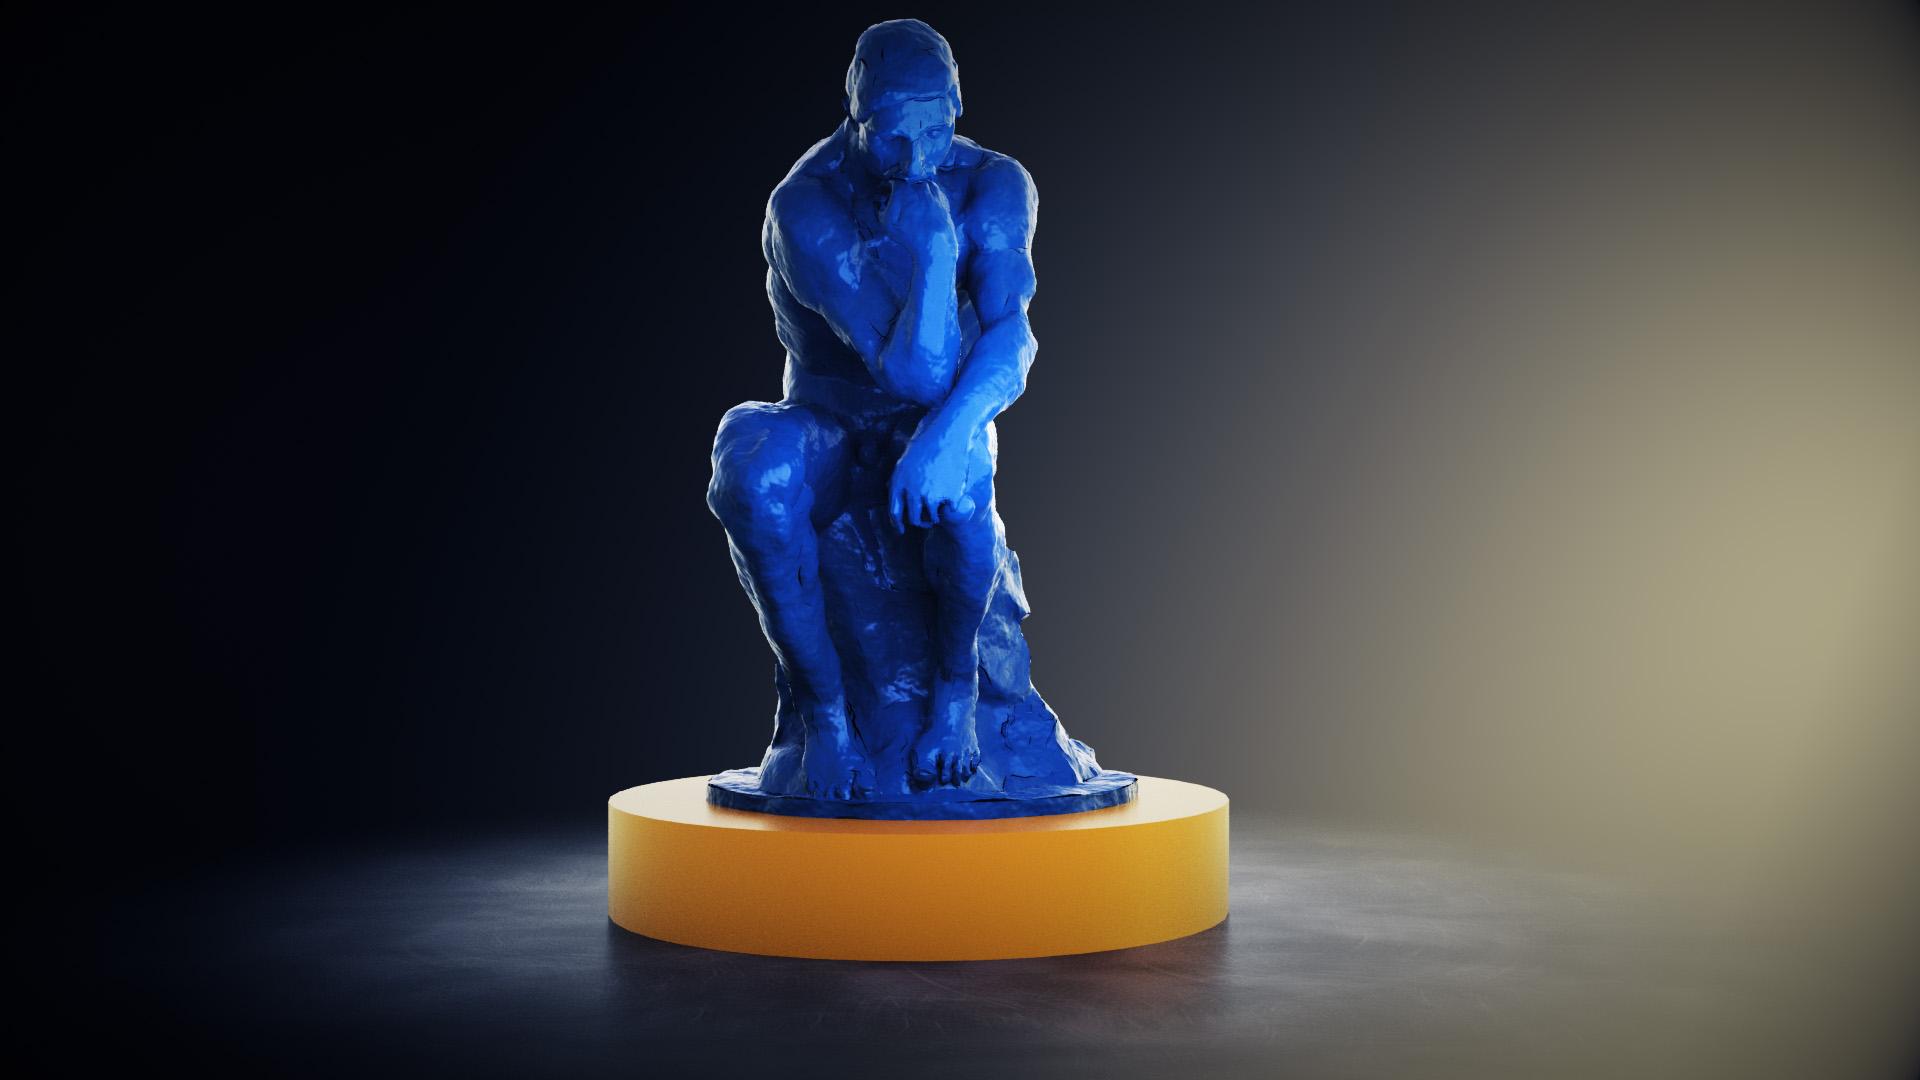 The_Thinker(pedestal)_splash